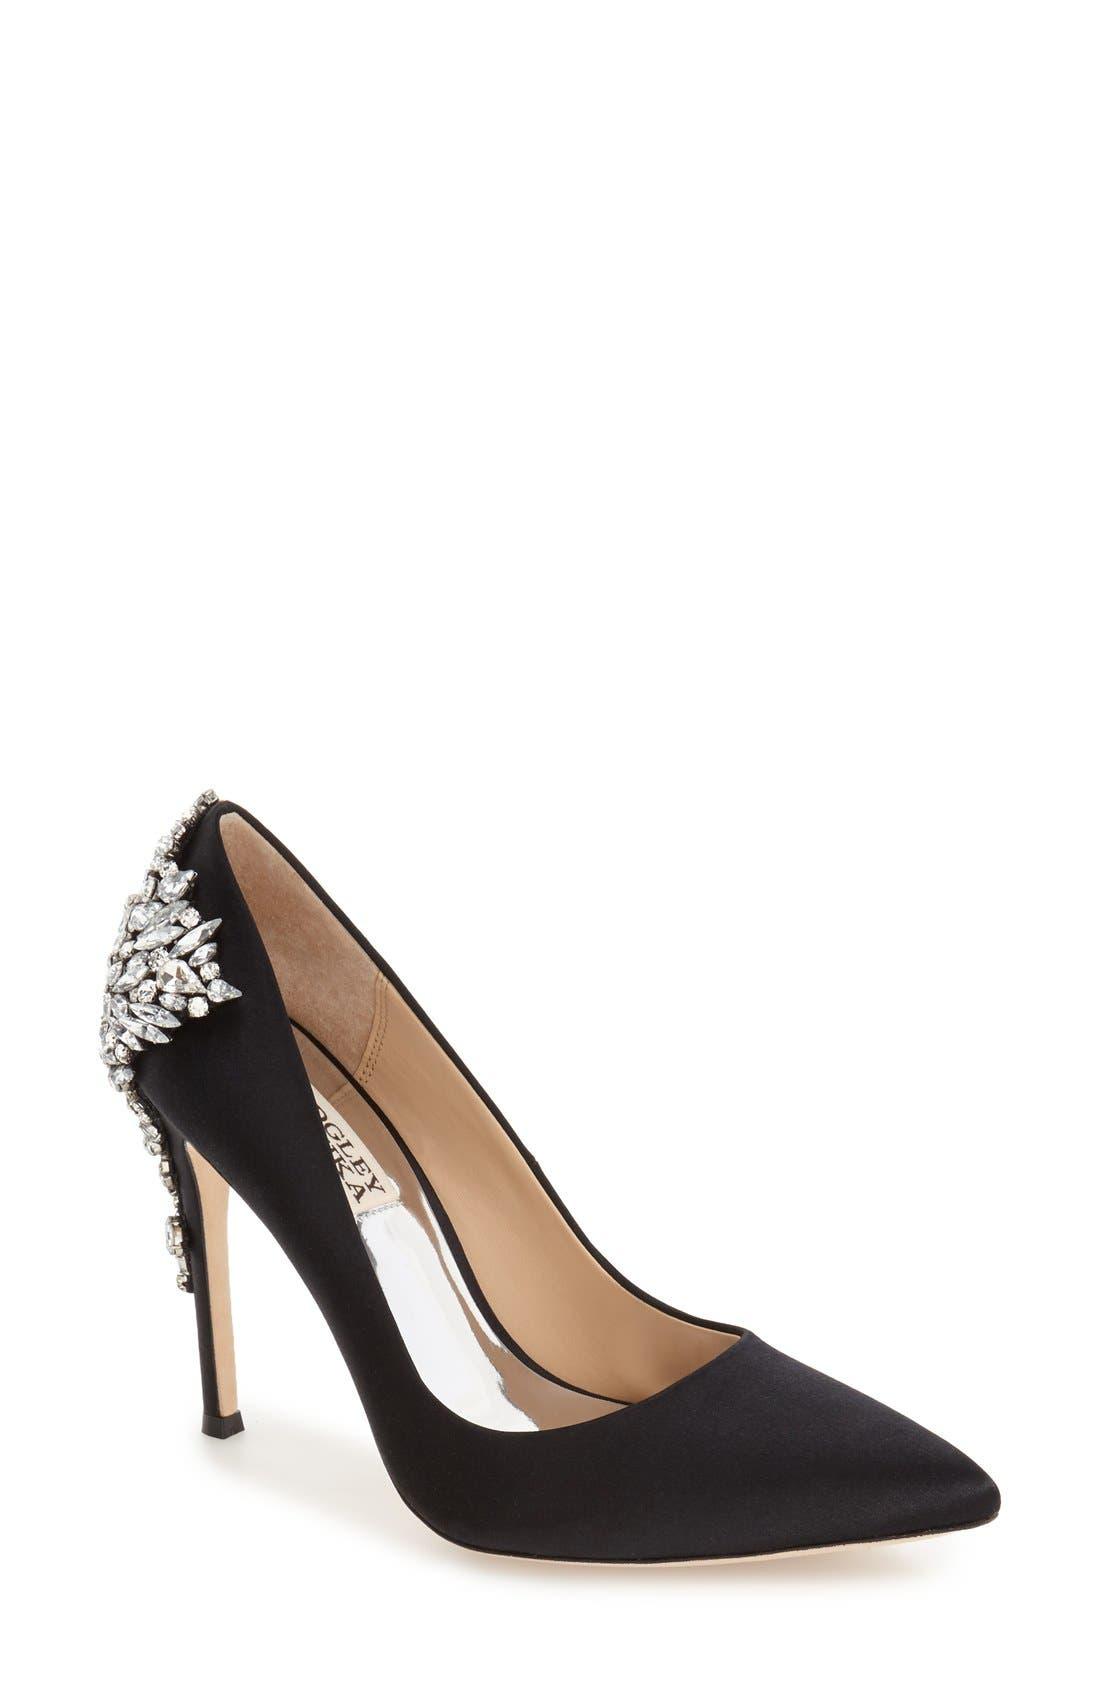 Main Image - Badgley Mischka 'Gorgeous' Crystal Embellished Pointy Toe Pump (Women)